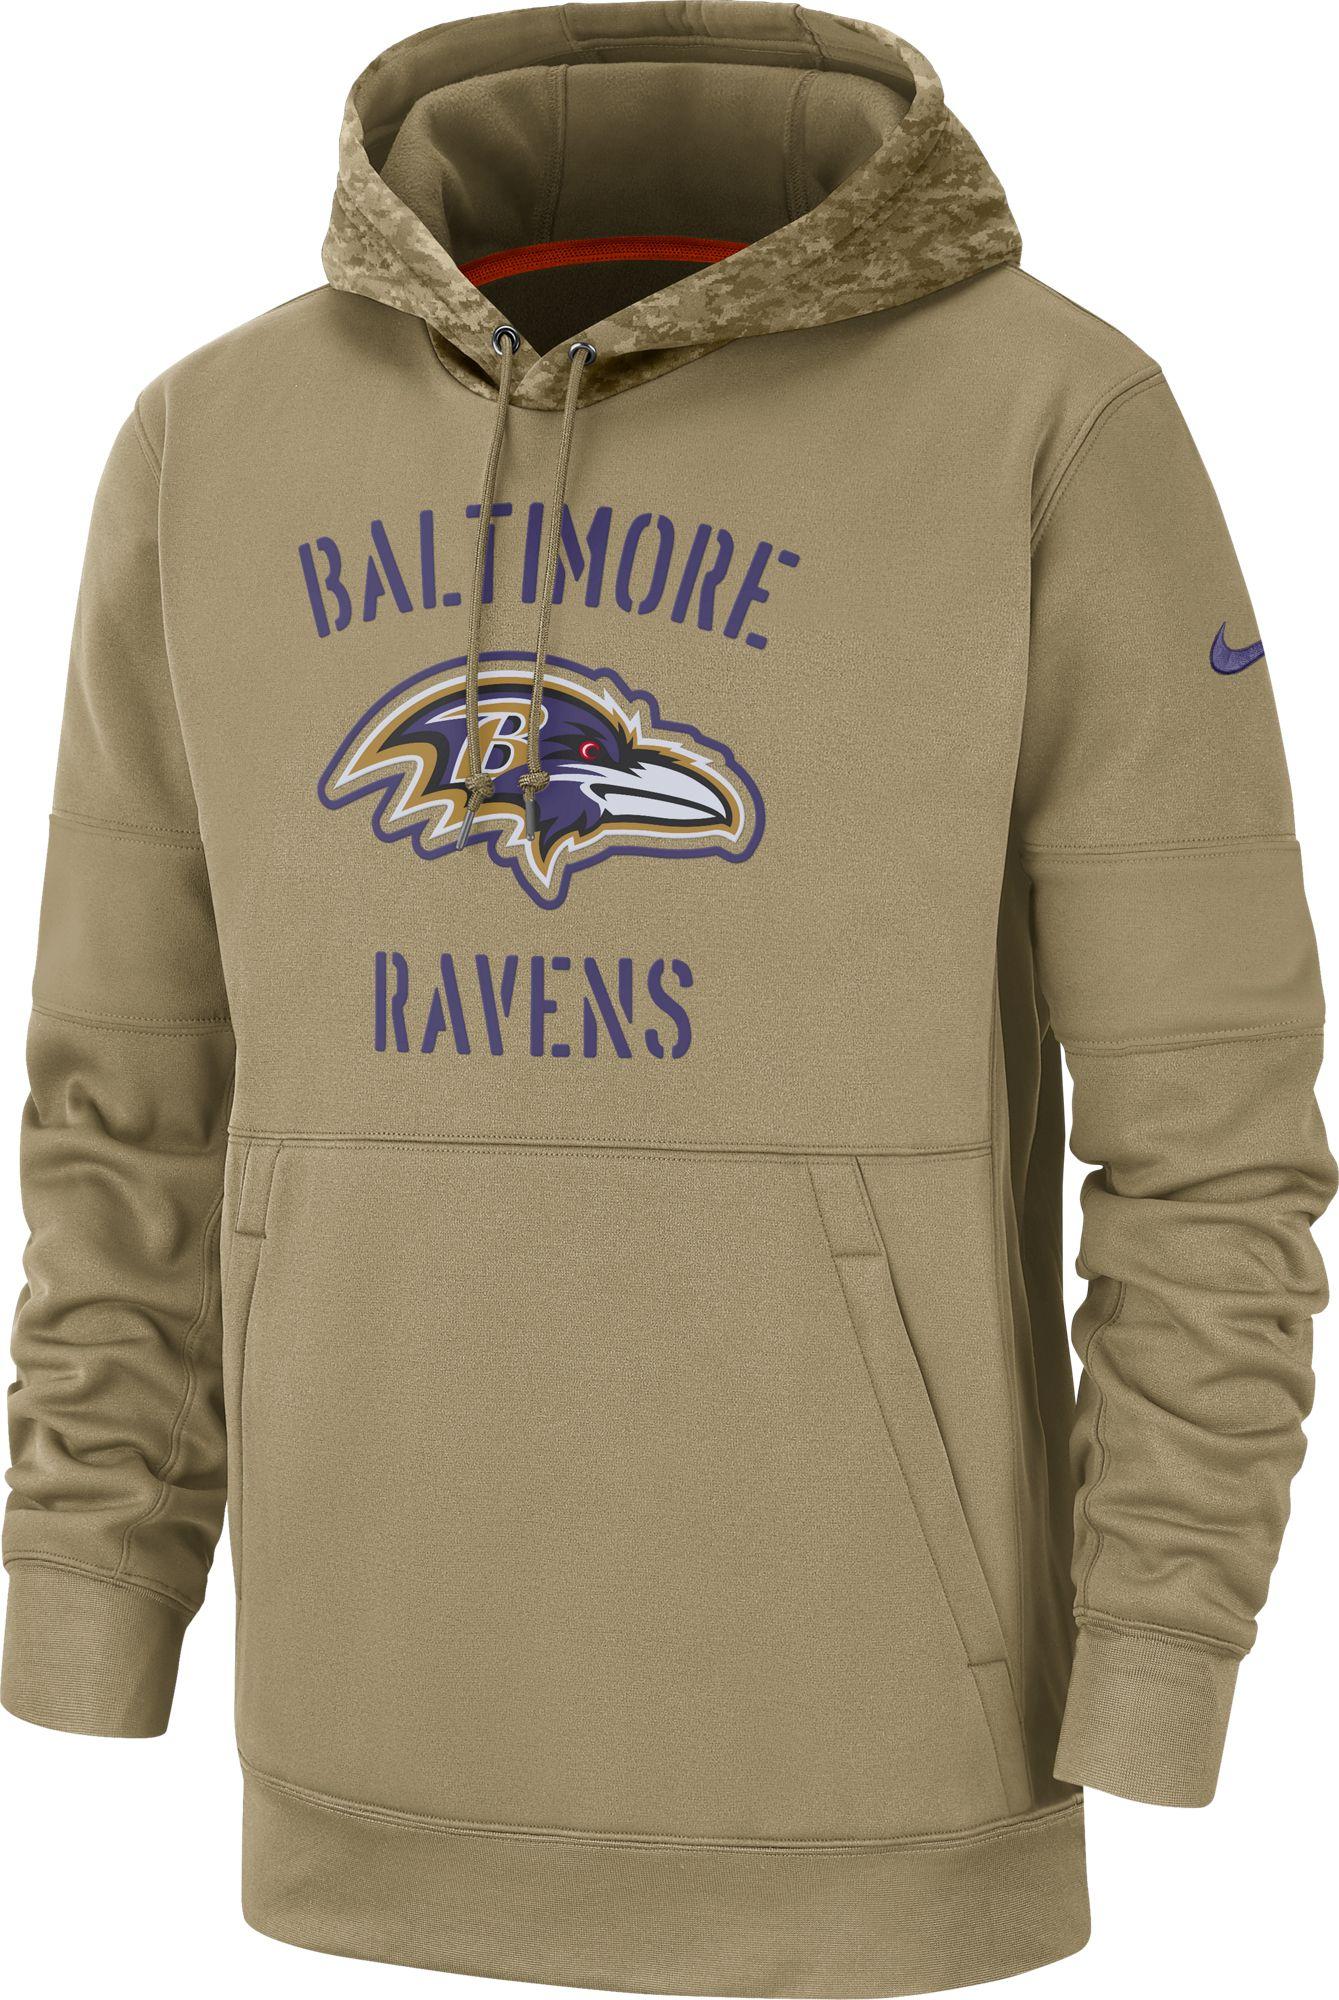 nfl ravens sweatshirt